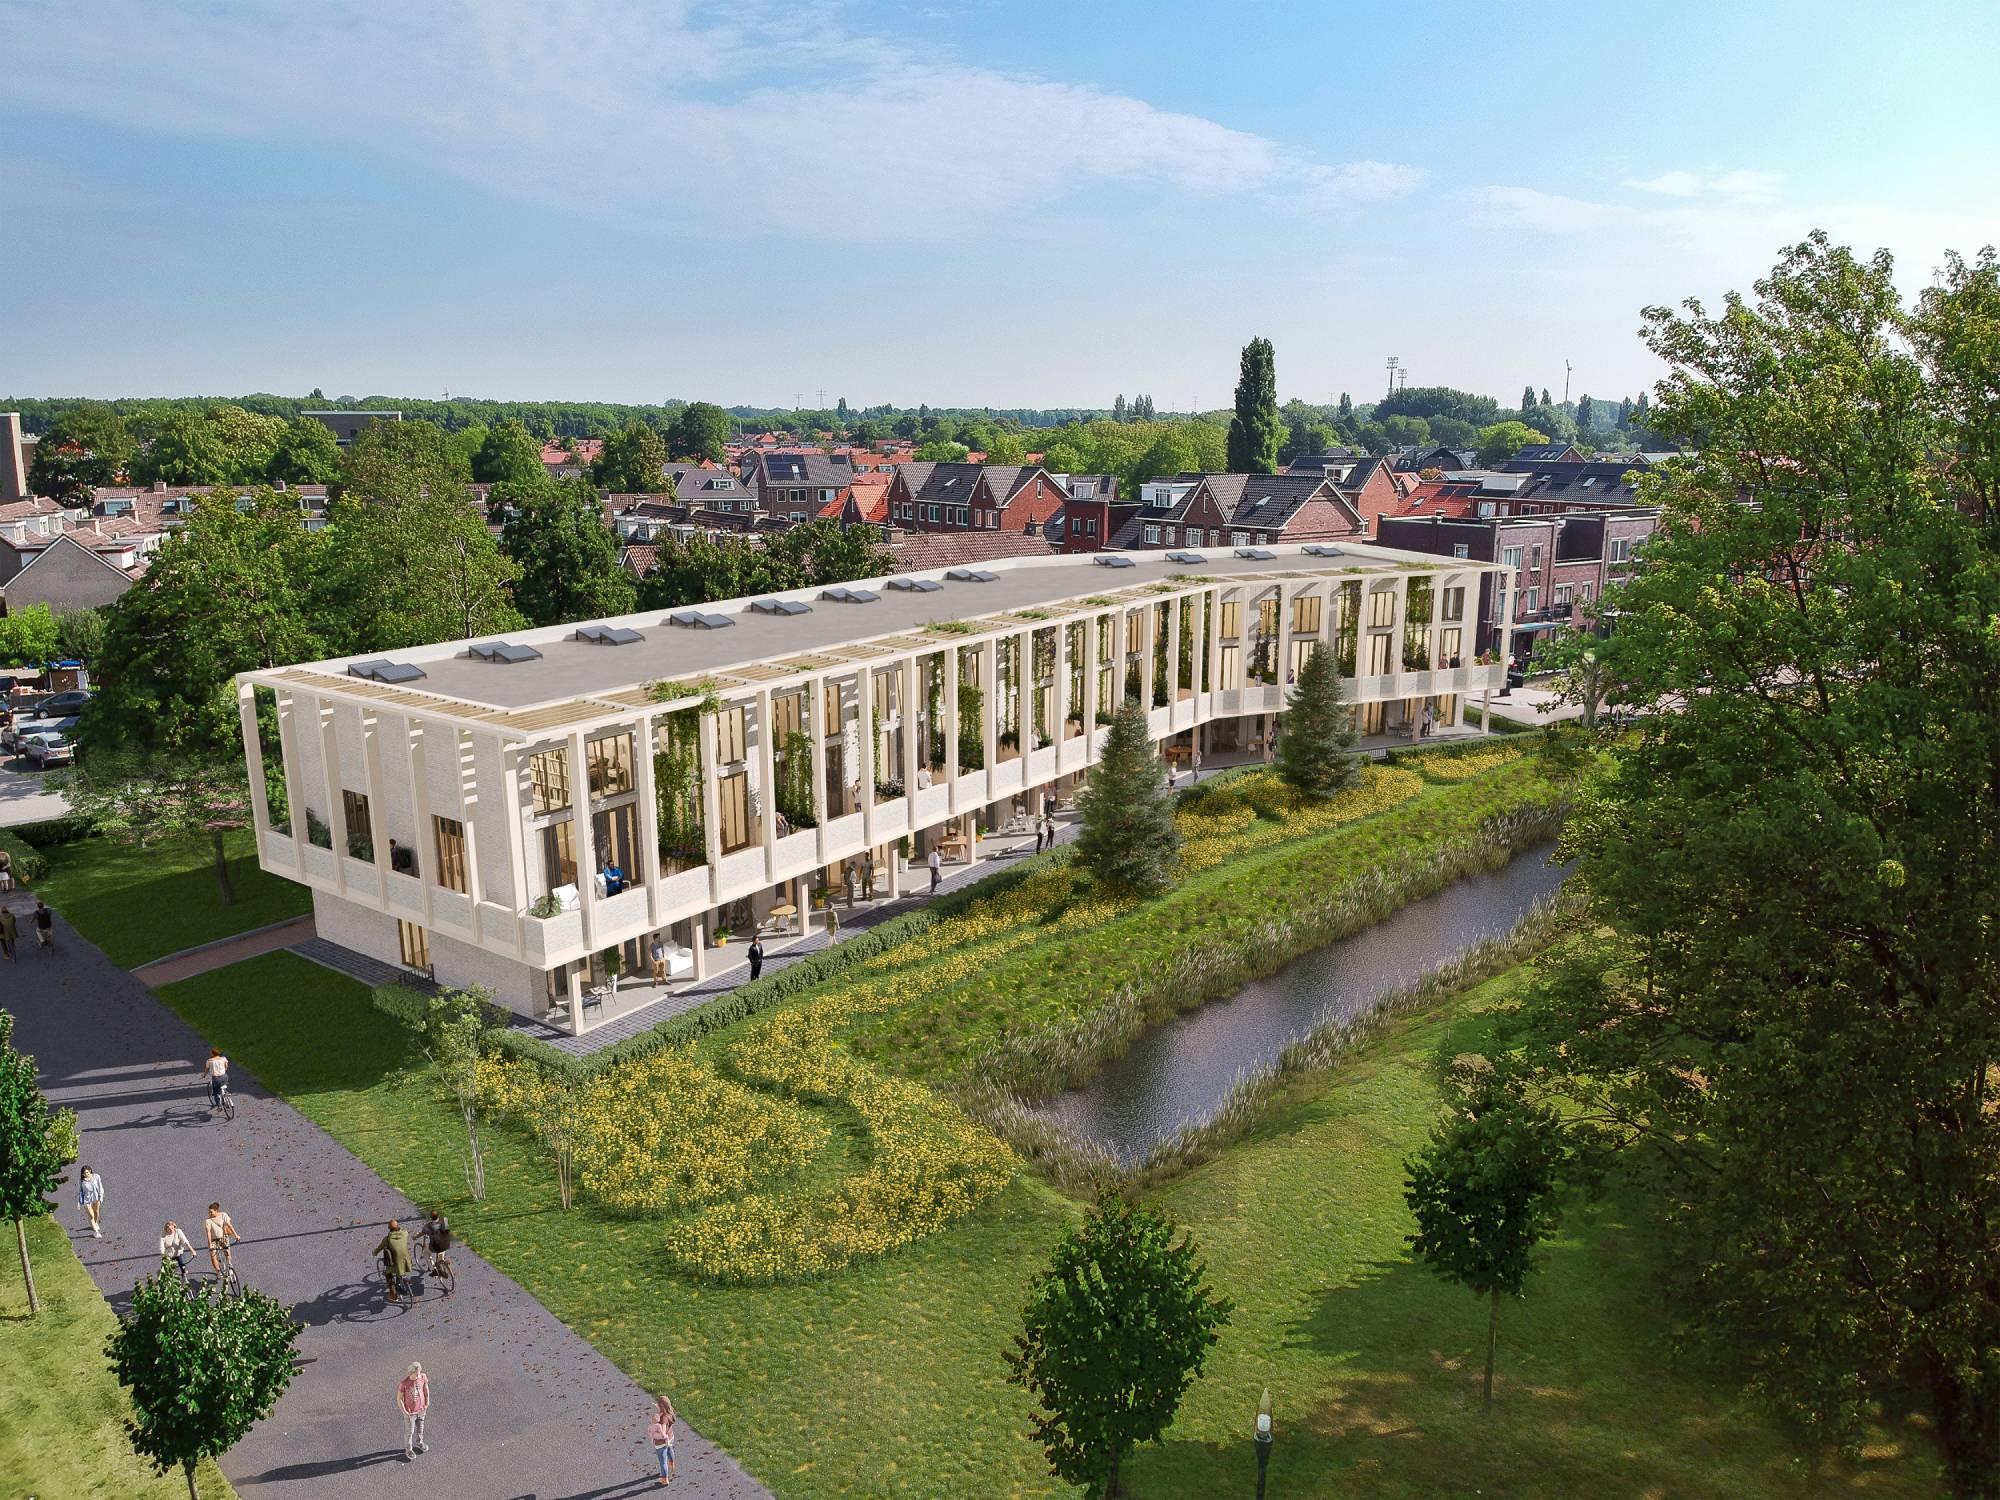 De Valk nieuwbouwproject Land van Valk exterieur wonen Dordrecht